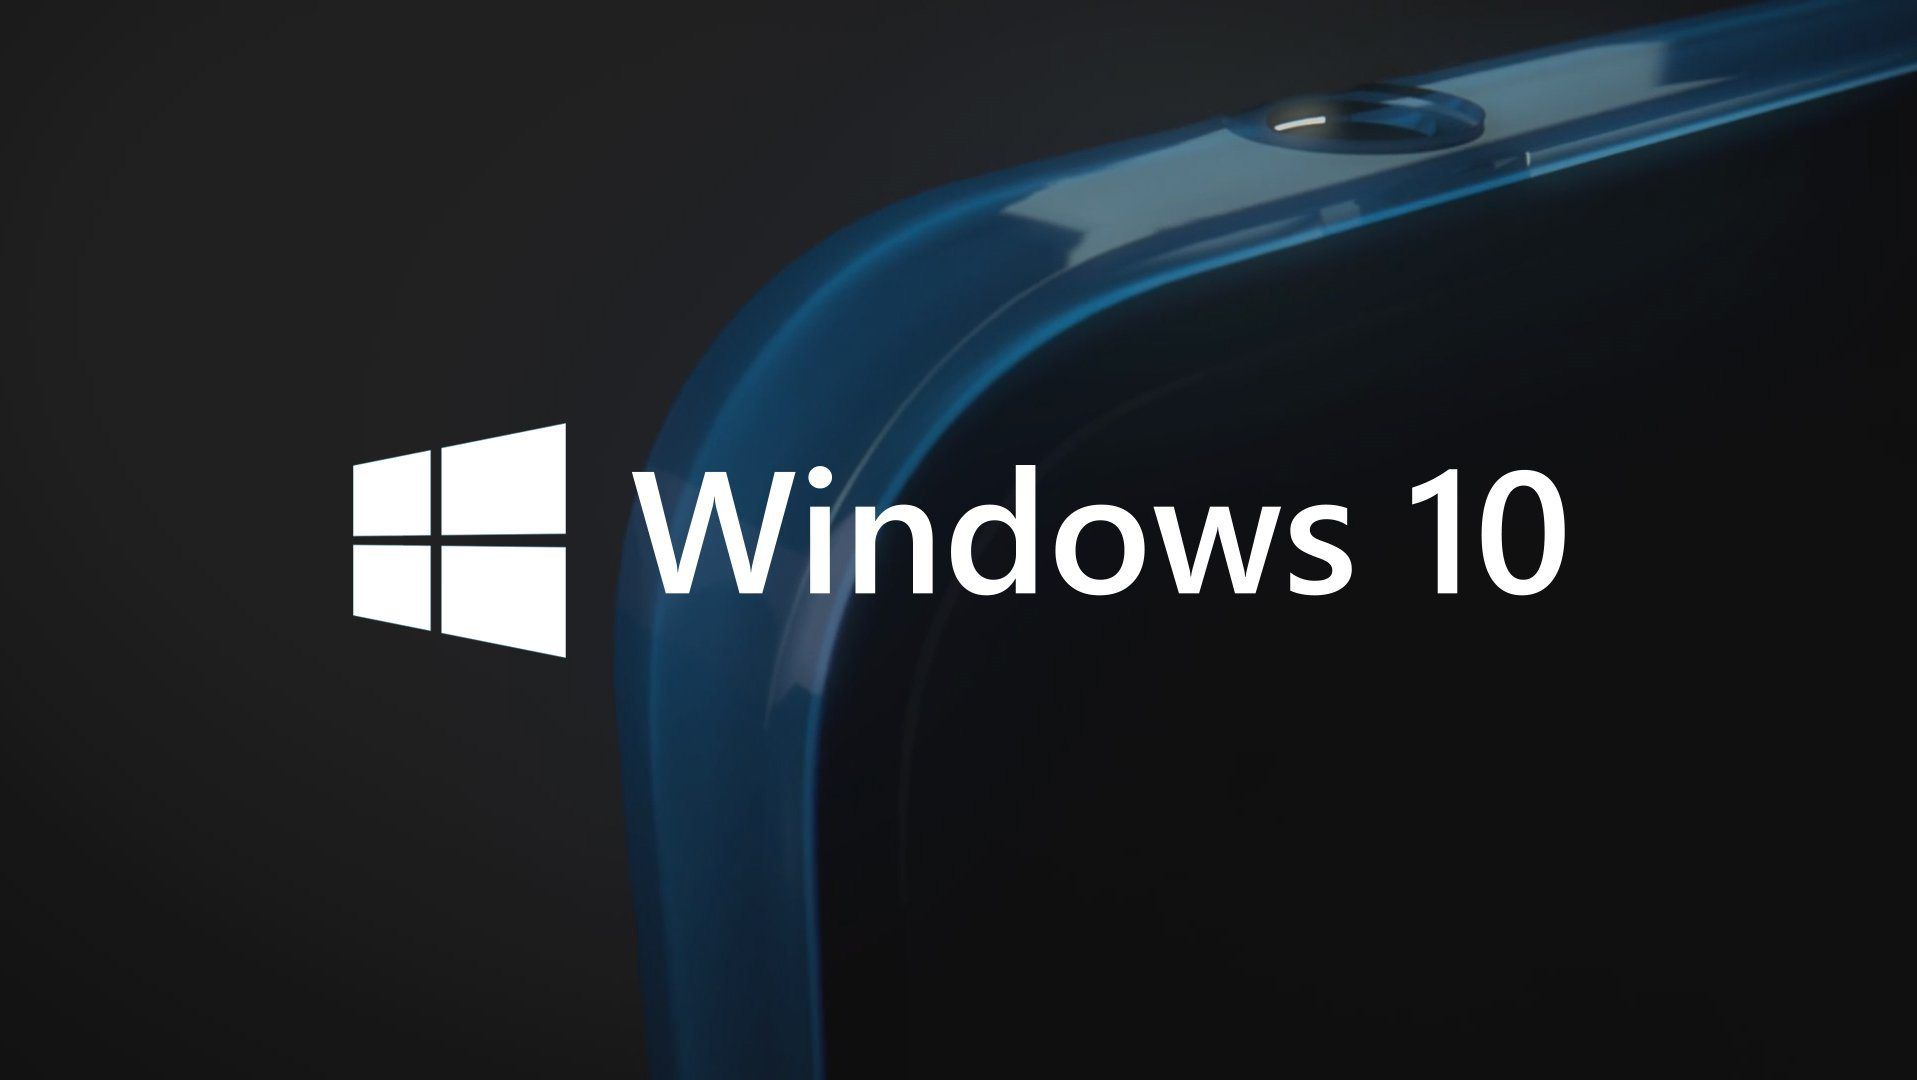 Windows 10 gratuito para todos os Insiders - http://www.showmetech.com.br/windows-10-gratuito-para-todos-os-insiders/